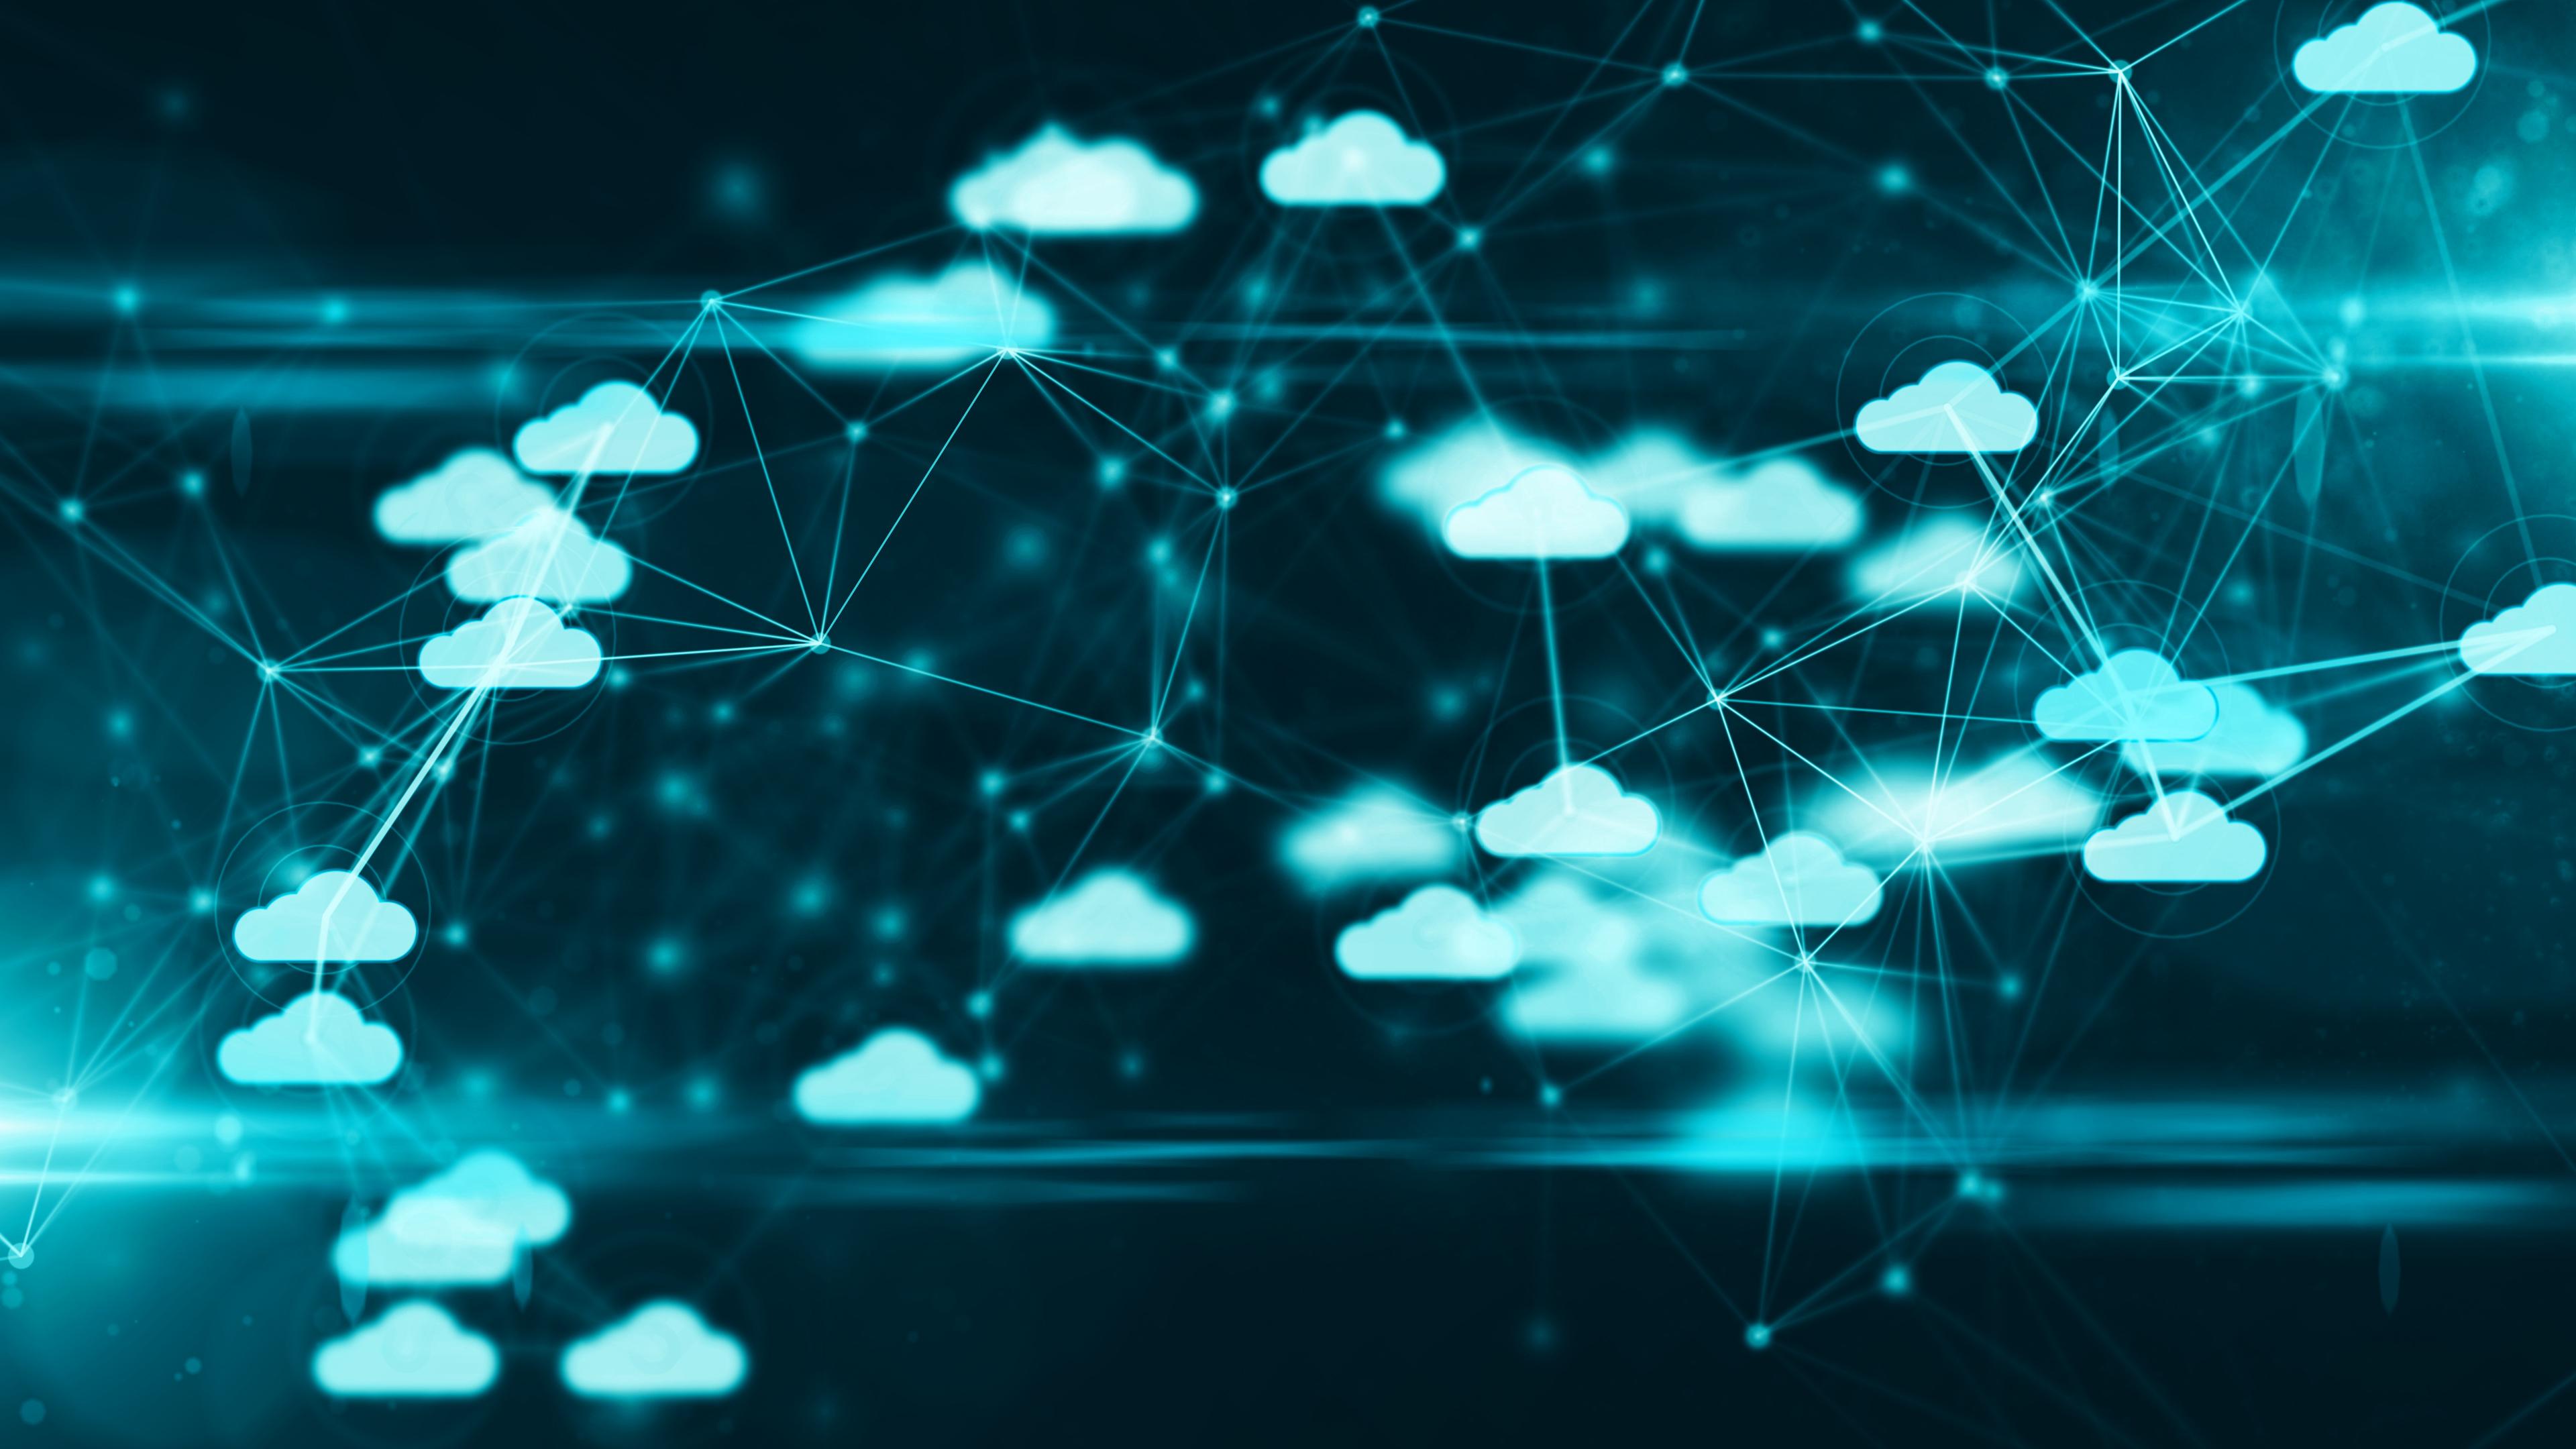 Illustration depicting cloud migration